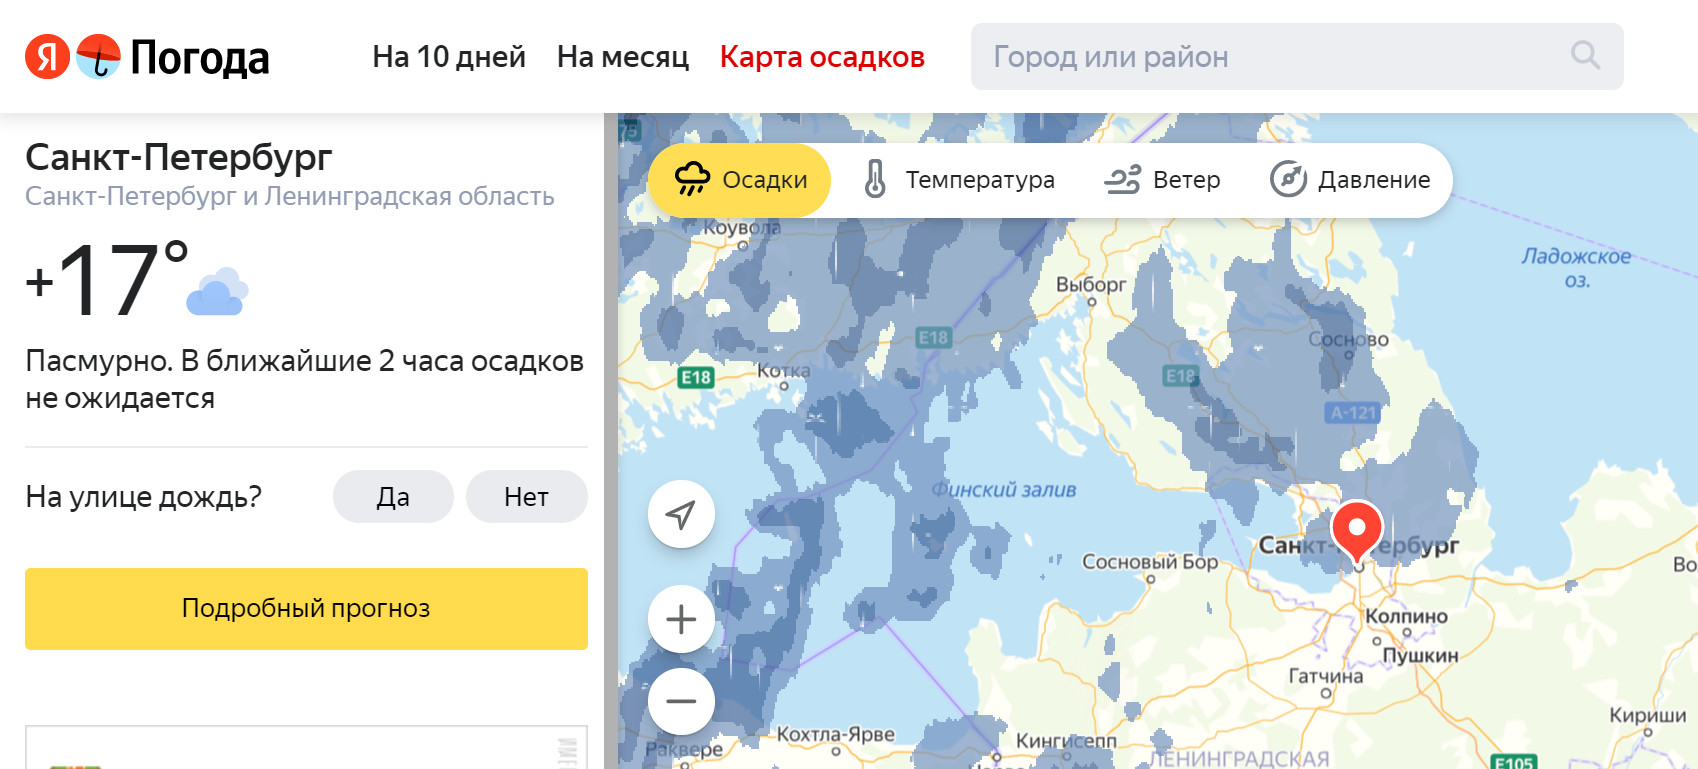 Скриншот с yandex.ru/pogoda/saint-petersburg